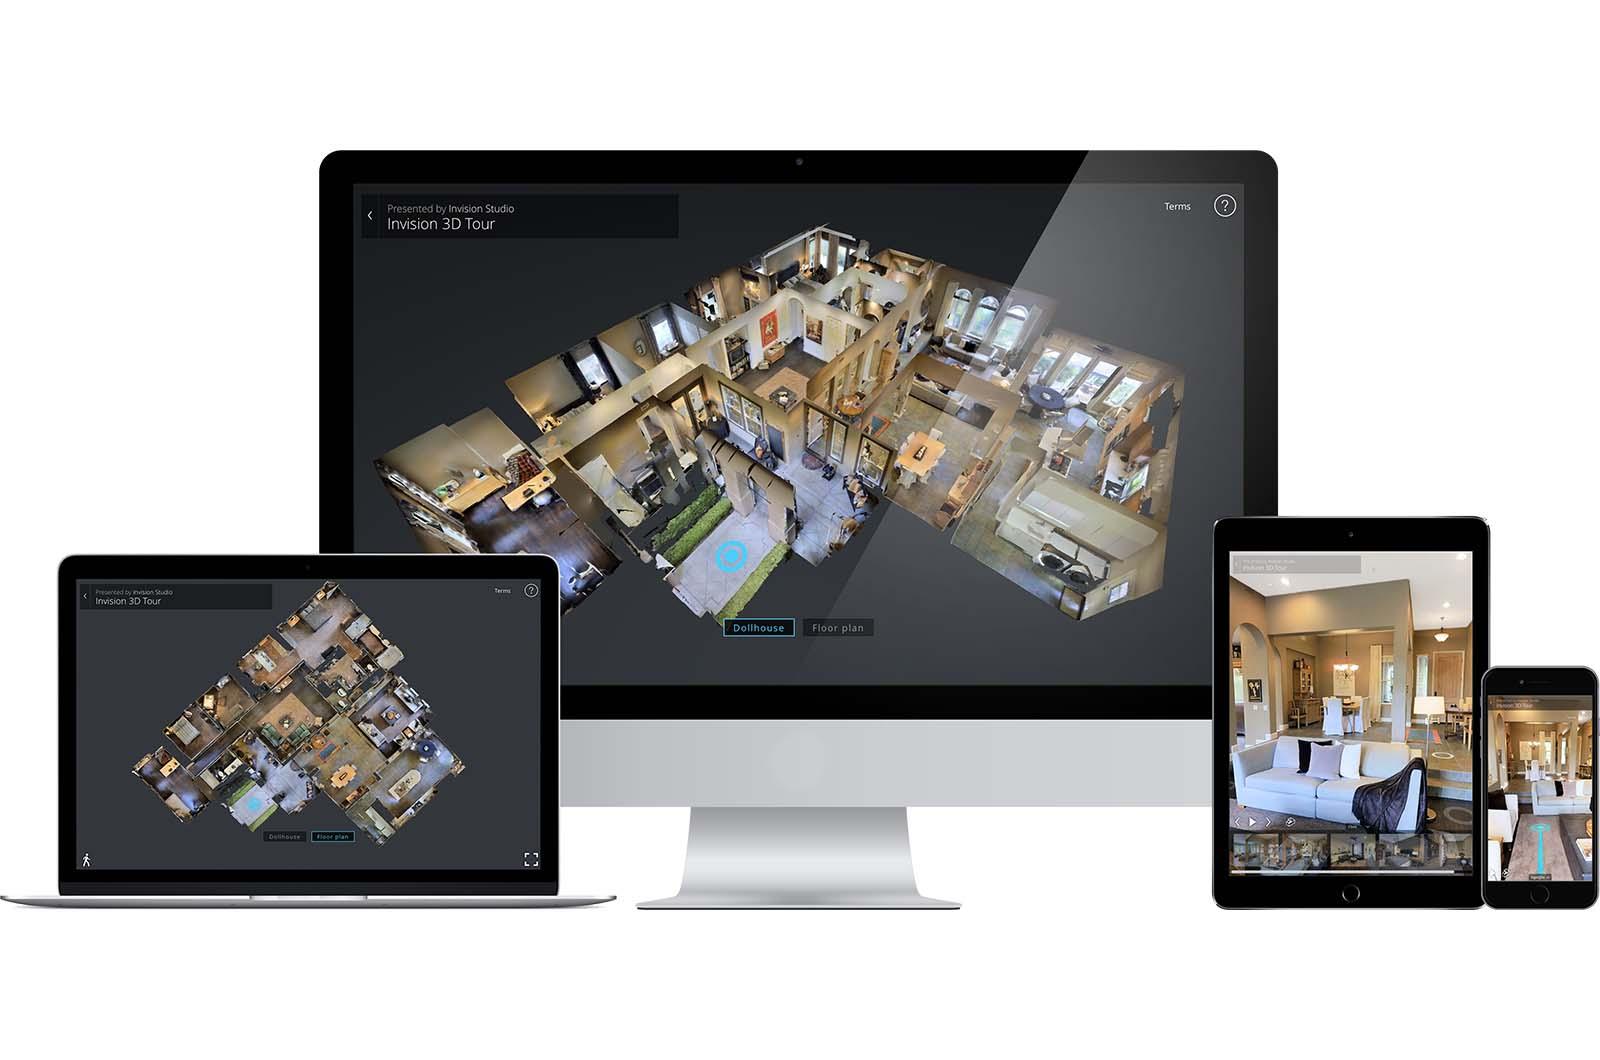 matterport multiple devices